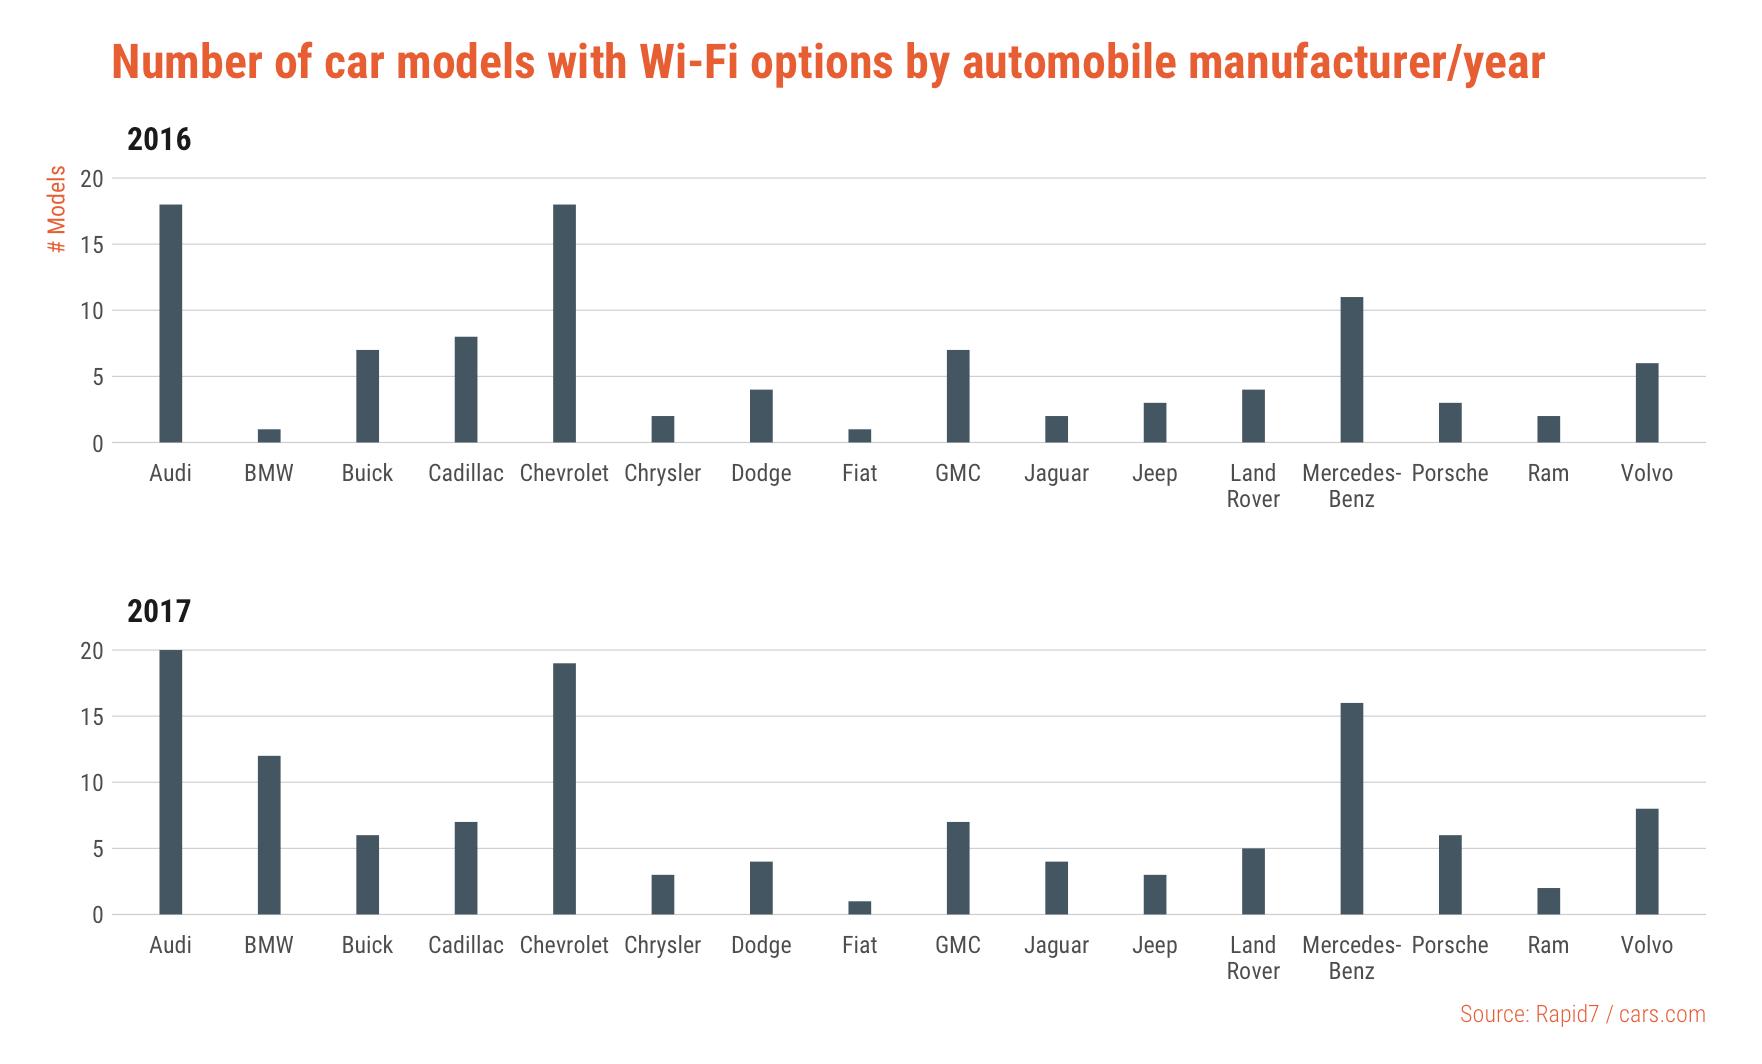 car-wifi-models